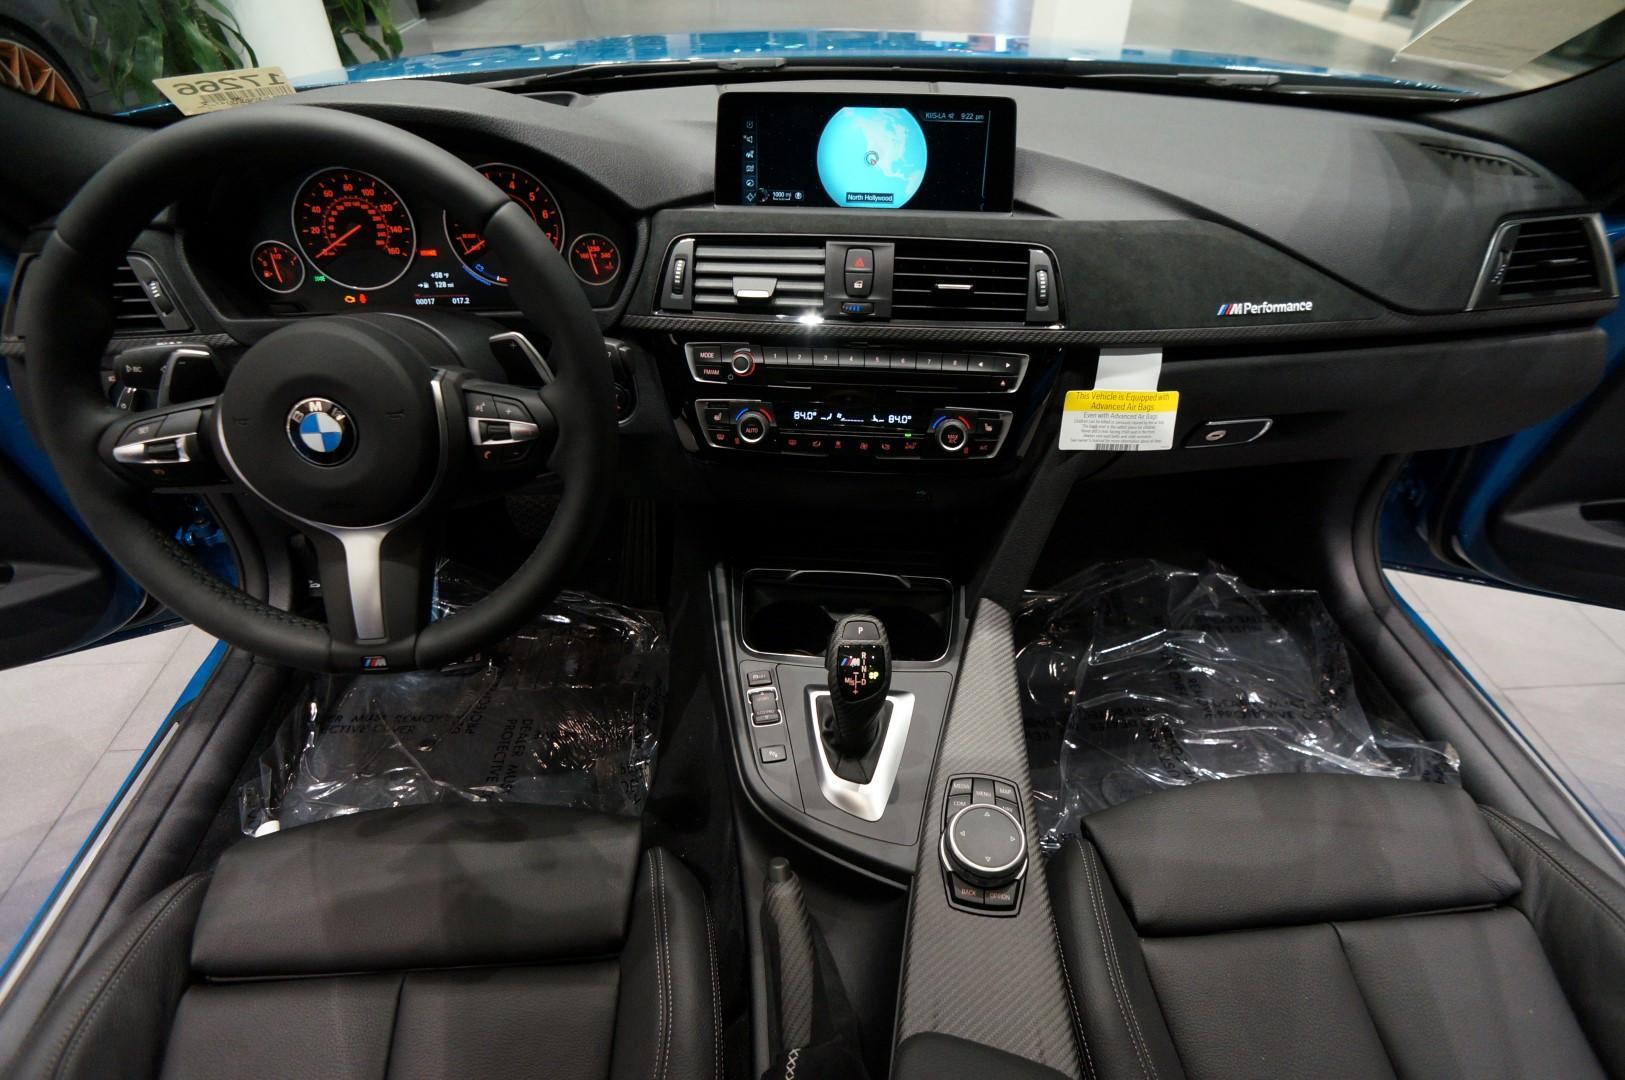 Poze Masini Noi Bmw 330i Xdrive Sports Wagon De Vanzare 462793